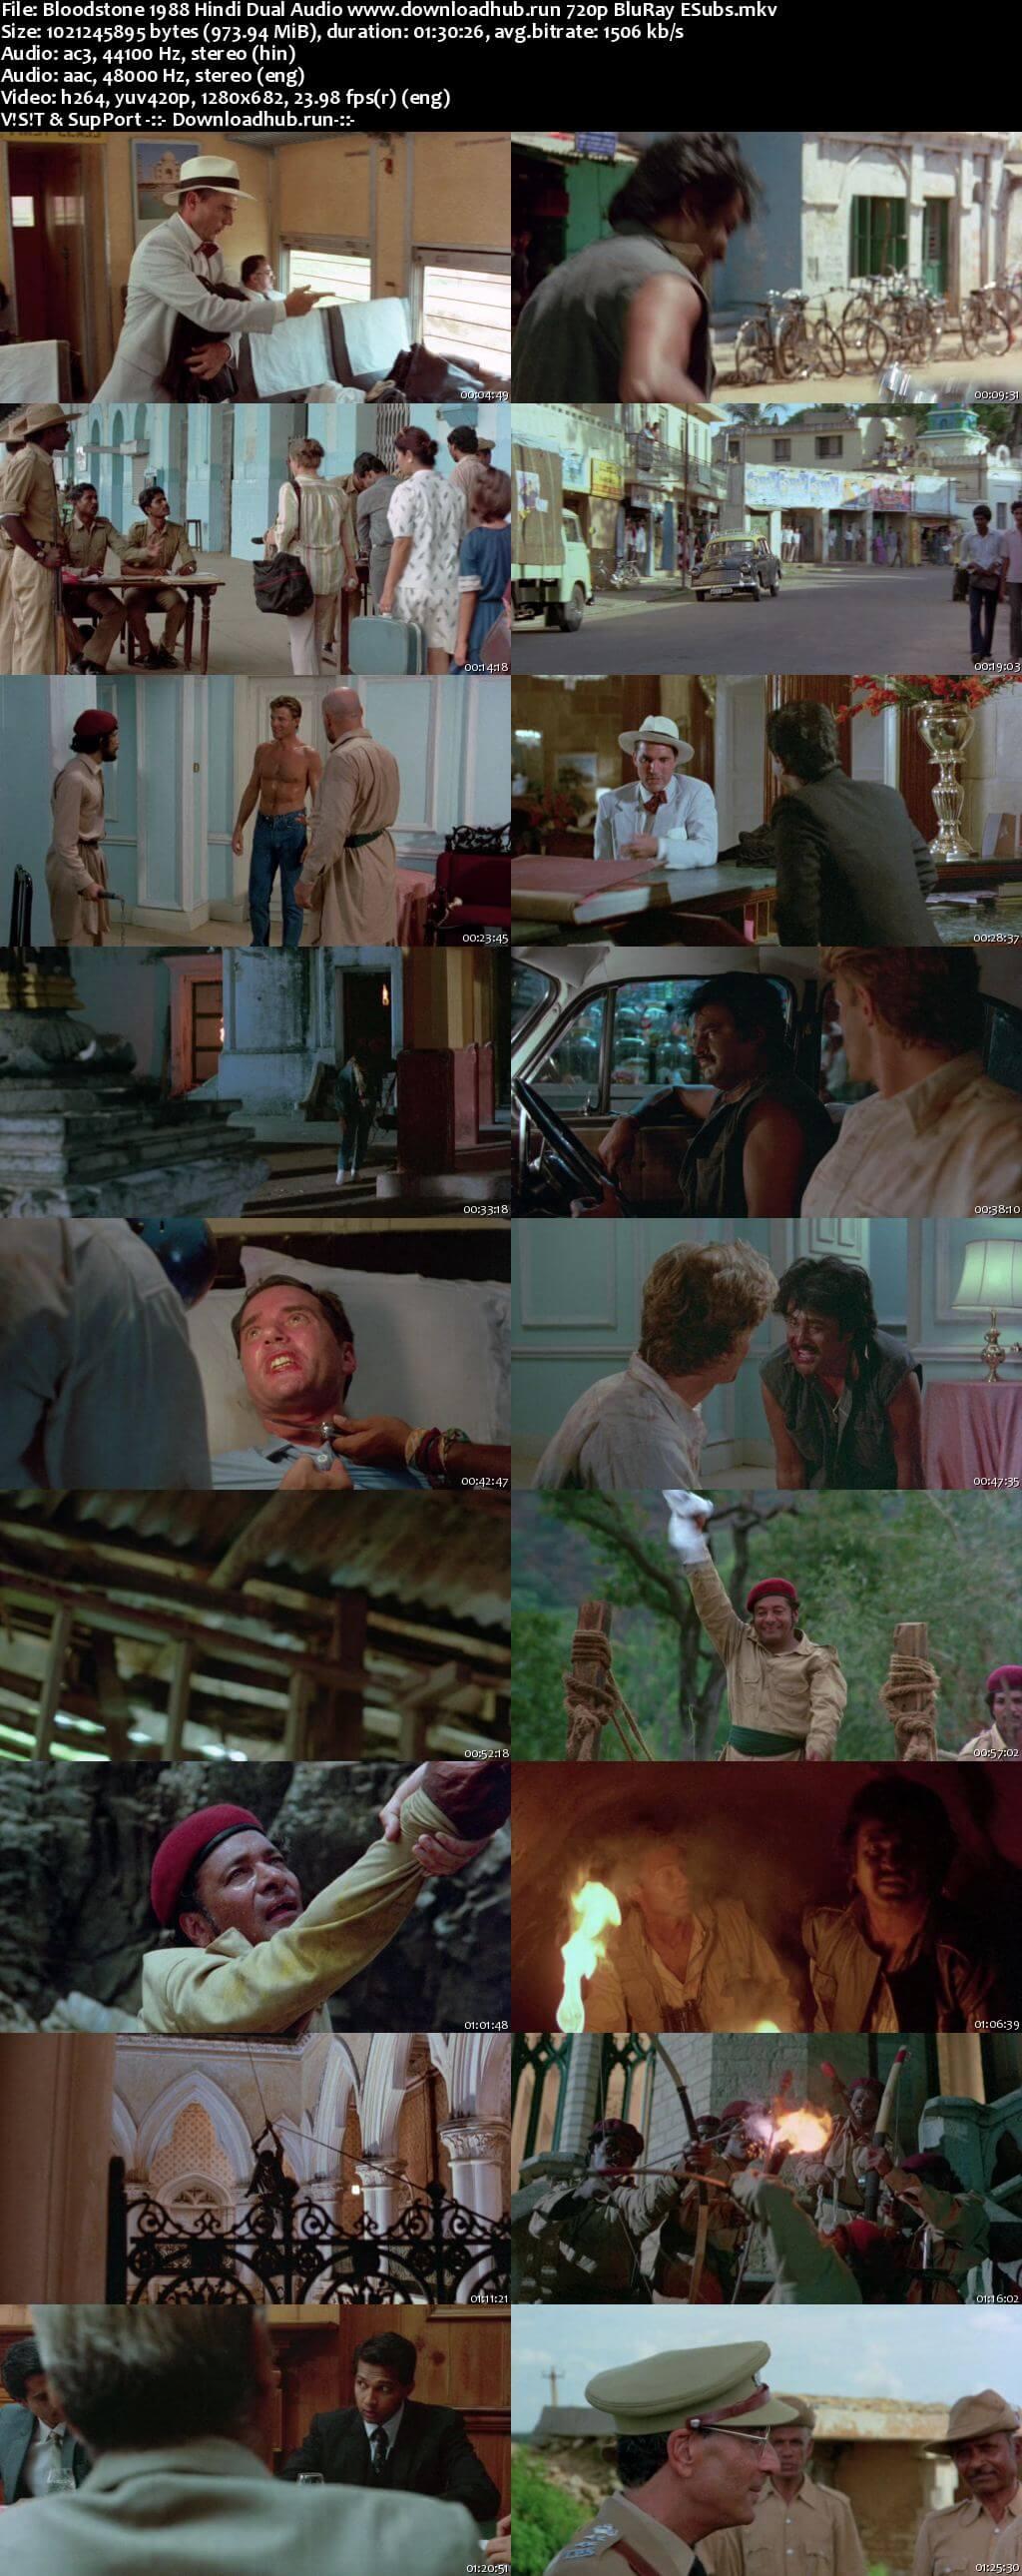 Bloodstone 1988 Hindi Dual Audio 720p BluRay ESubs